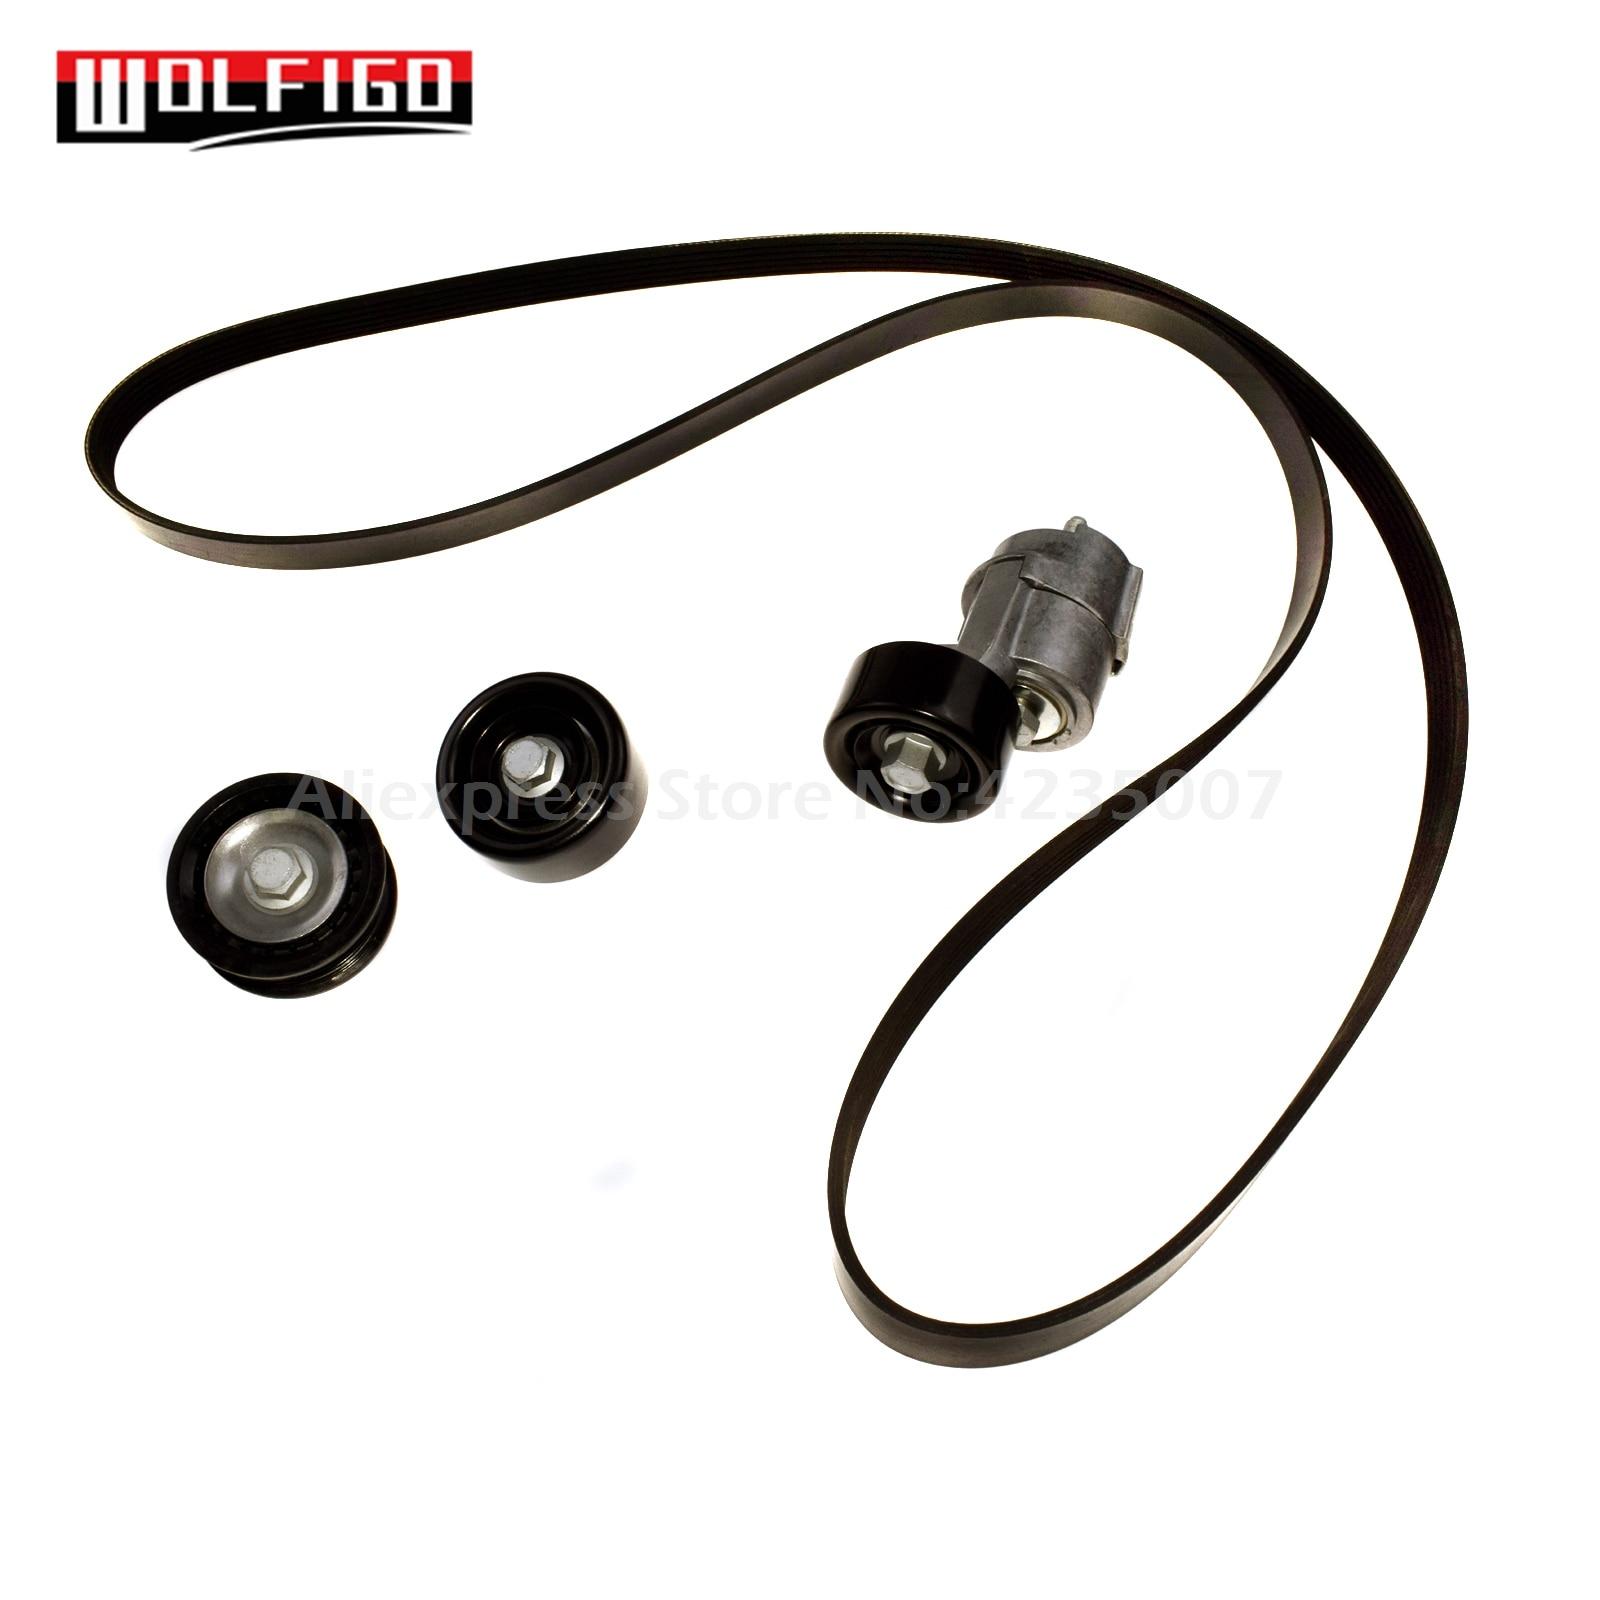 American Shifter 109983 Black Shift Knob with M16 x 1.5 Insert Yellow Chinese Symbol #2